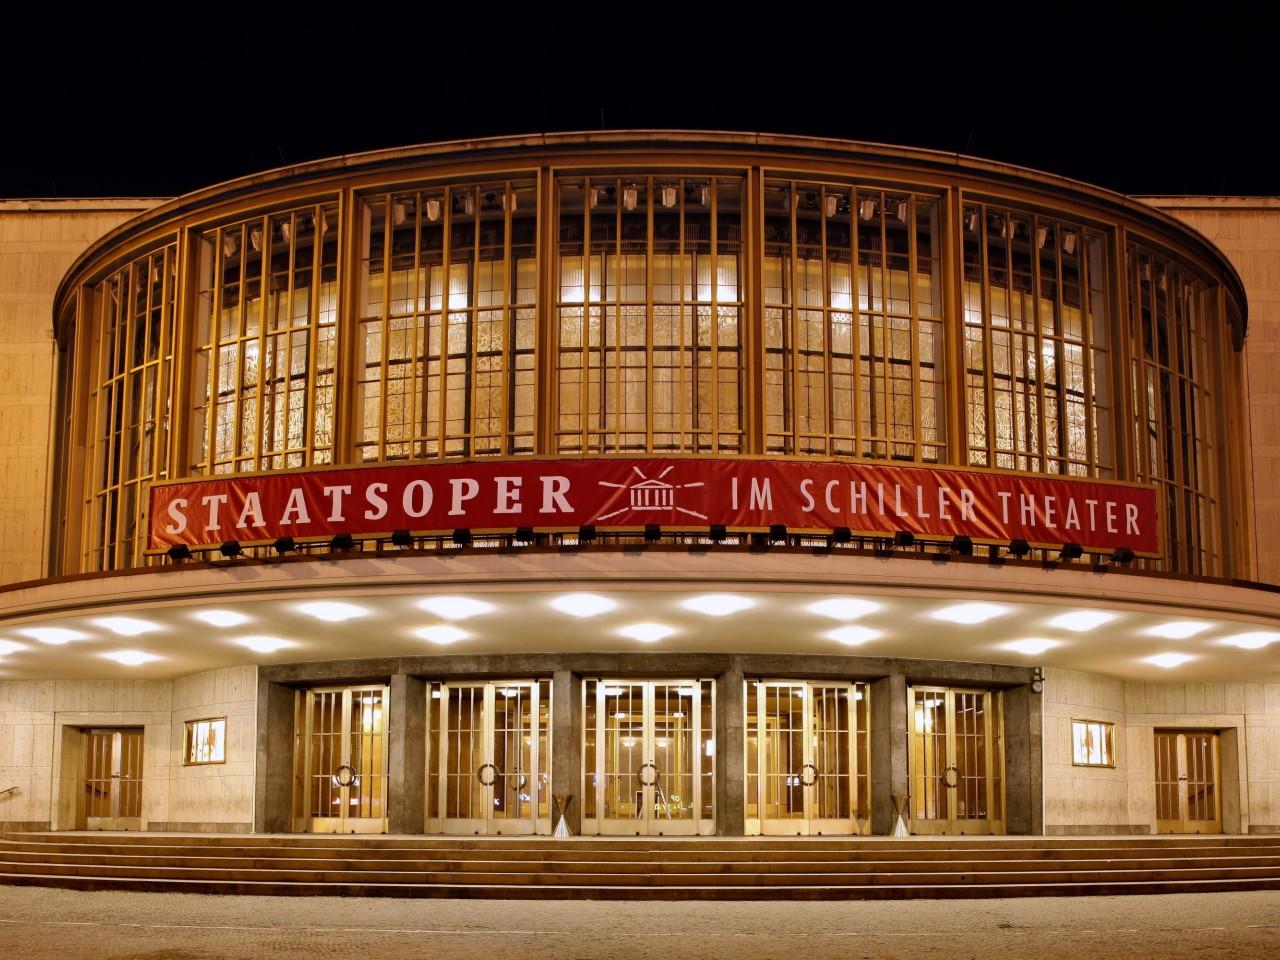 The Berlin Staatsoper